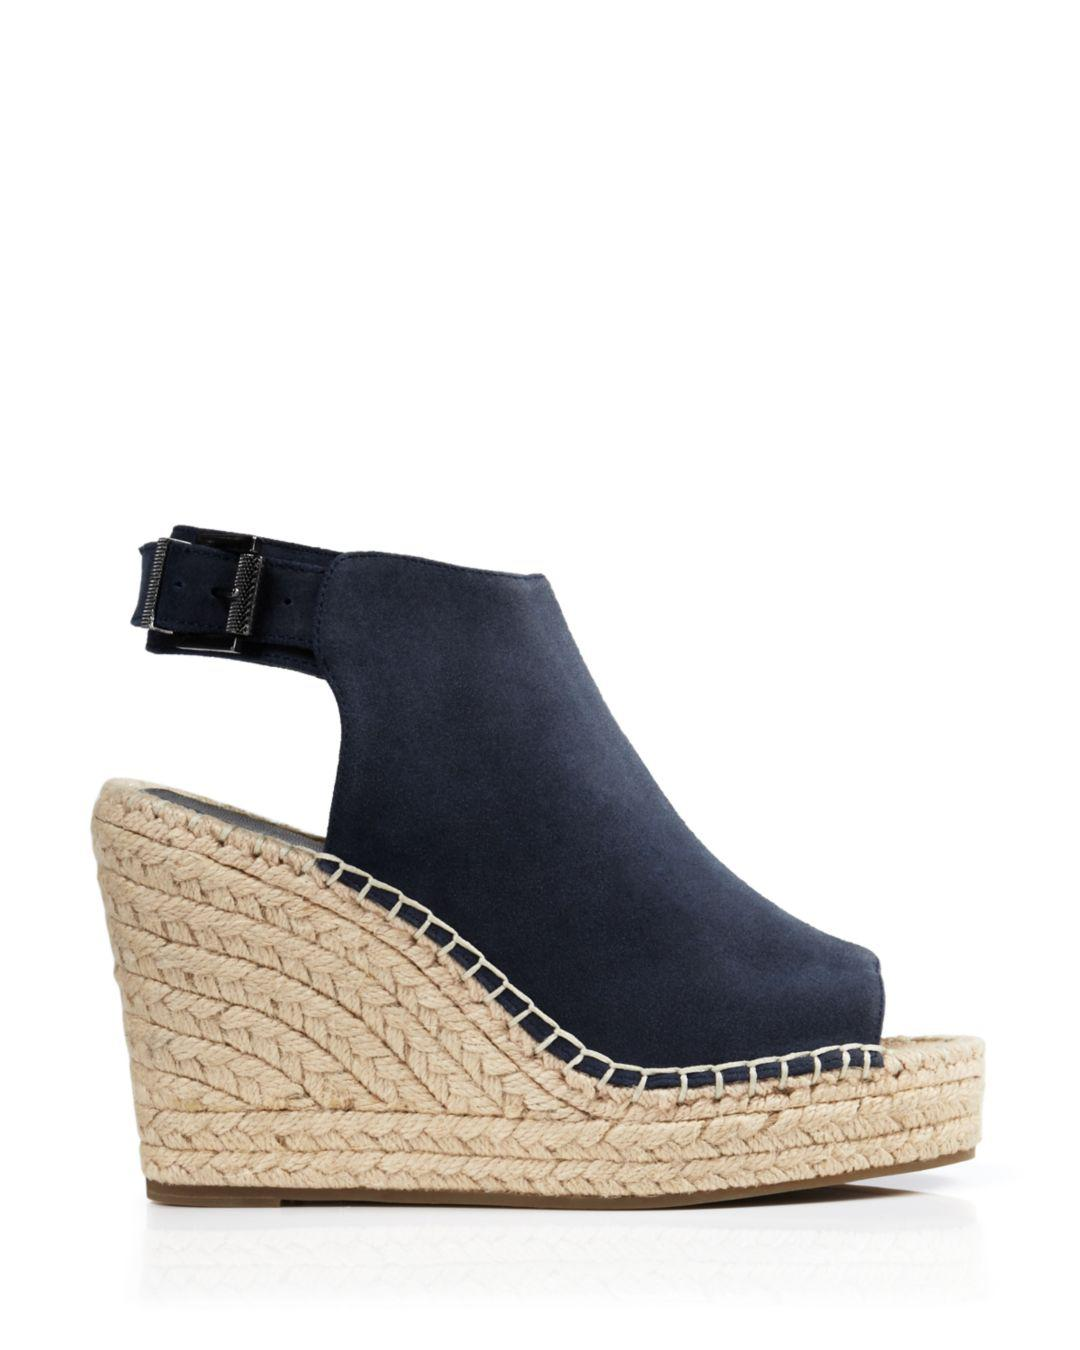 b2139c7be043 Lyst - Kenneth Cole Olivia Suede Espadrille Wedge Platform Sandals in Blue  - Save 54%